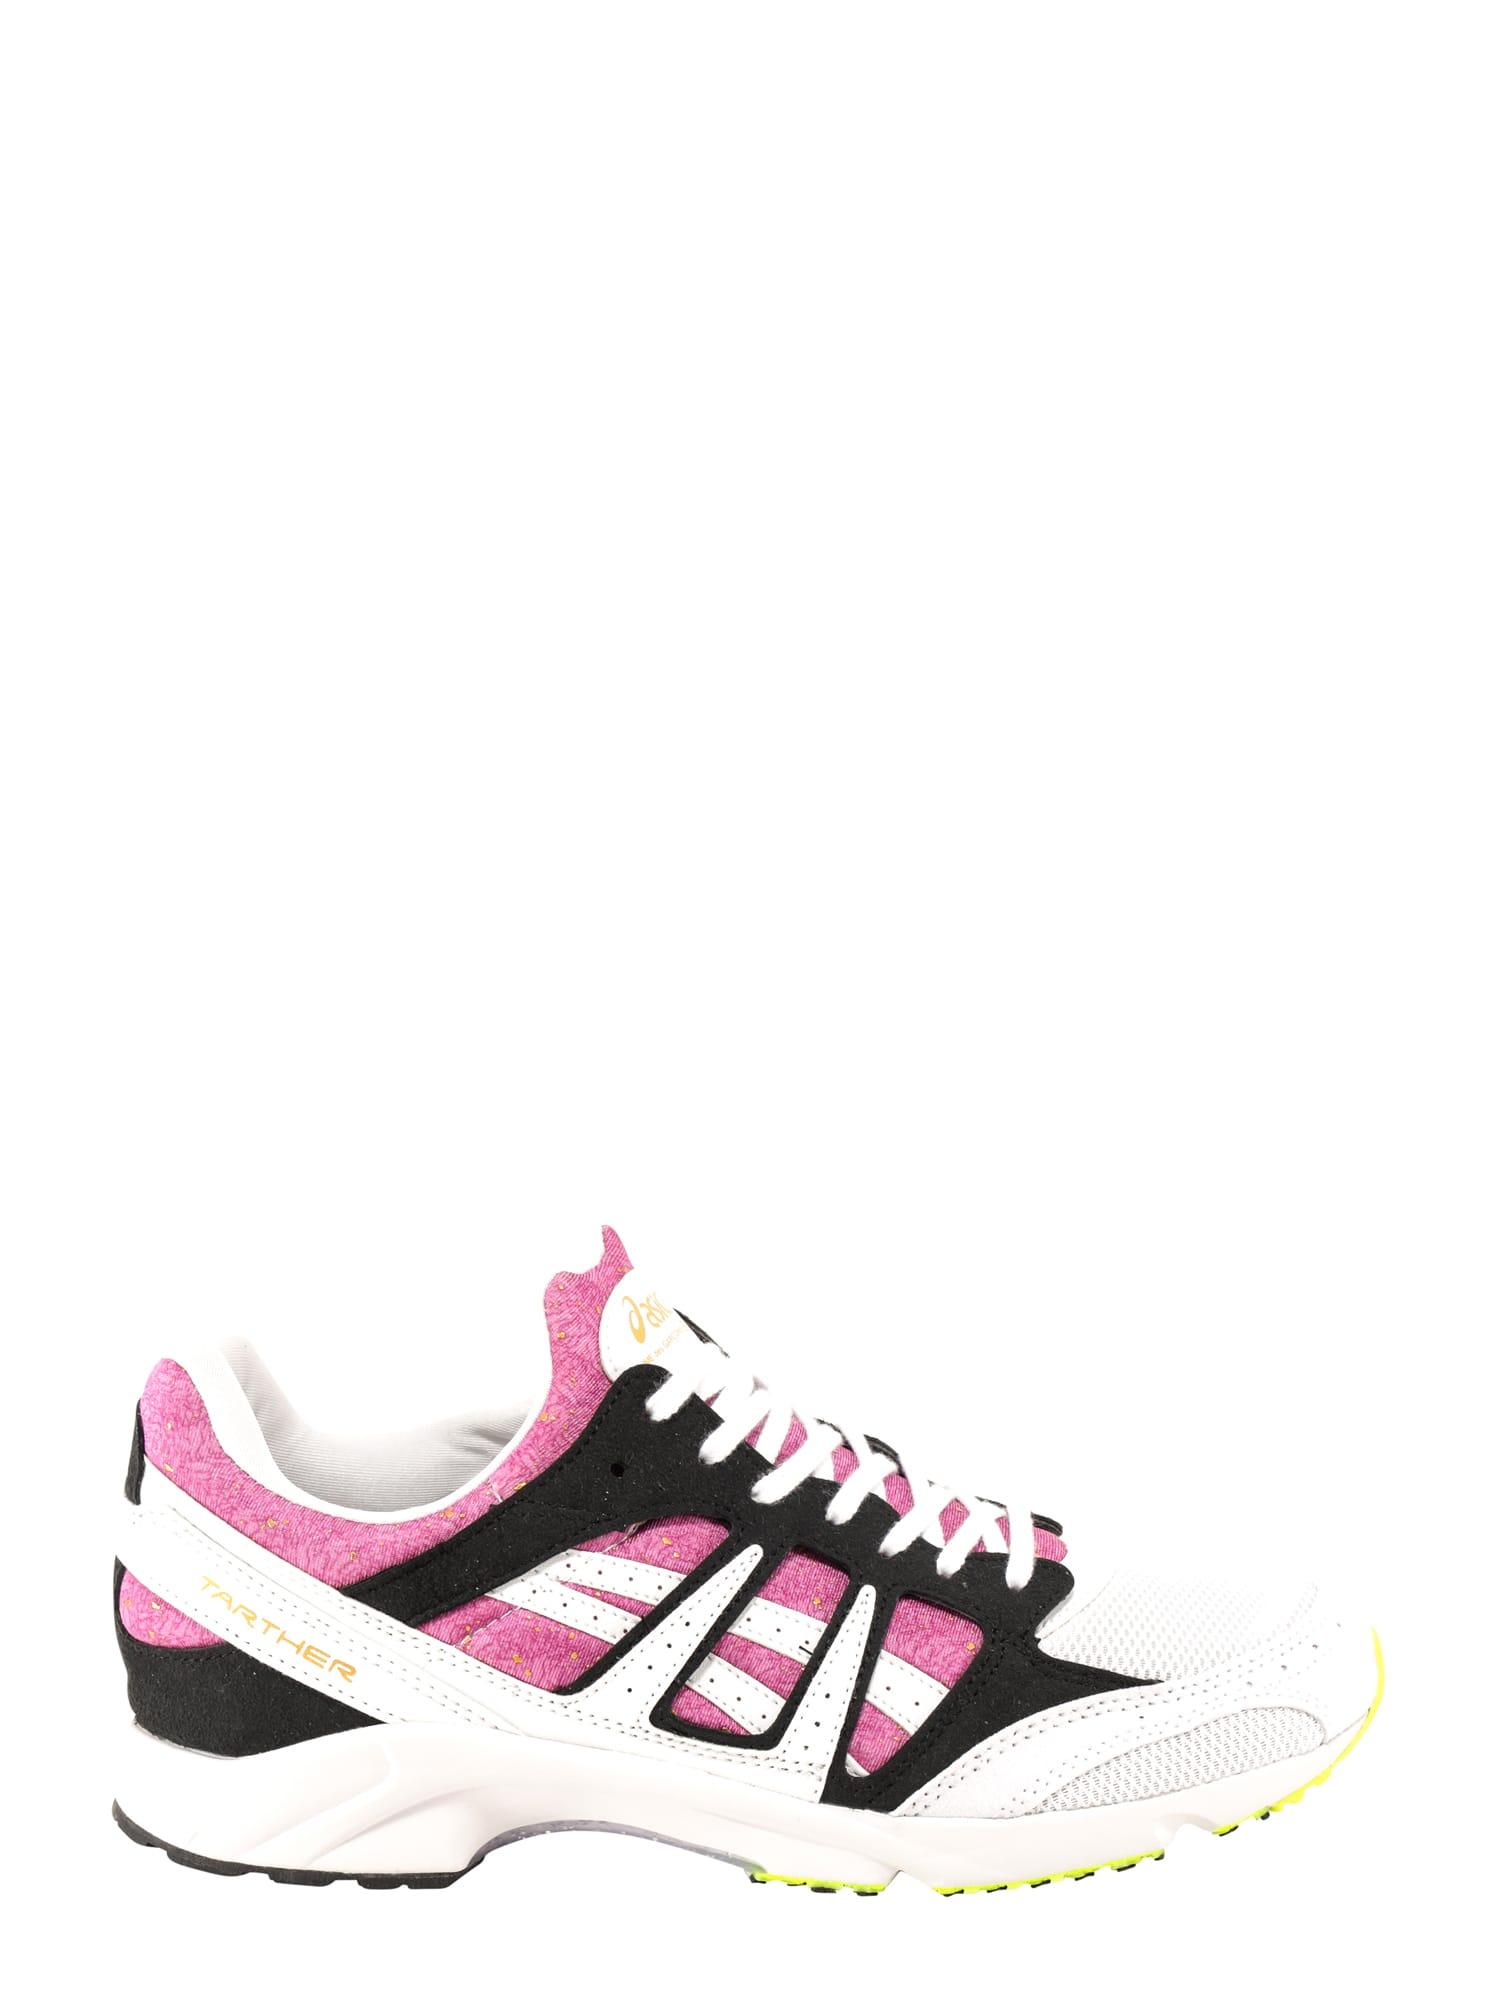 Comme Des Garçons Shirt Sneakers ASICS TARTHER X COMME DES GARCON SHIRT SNEAKERS